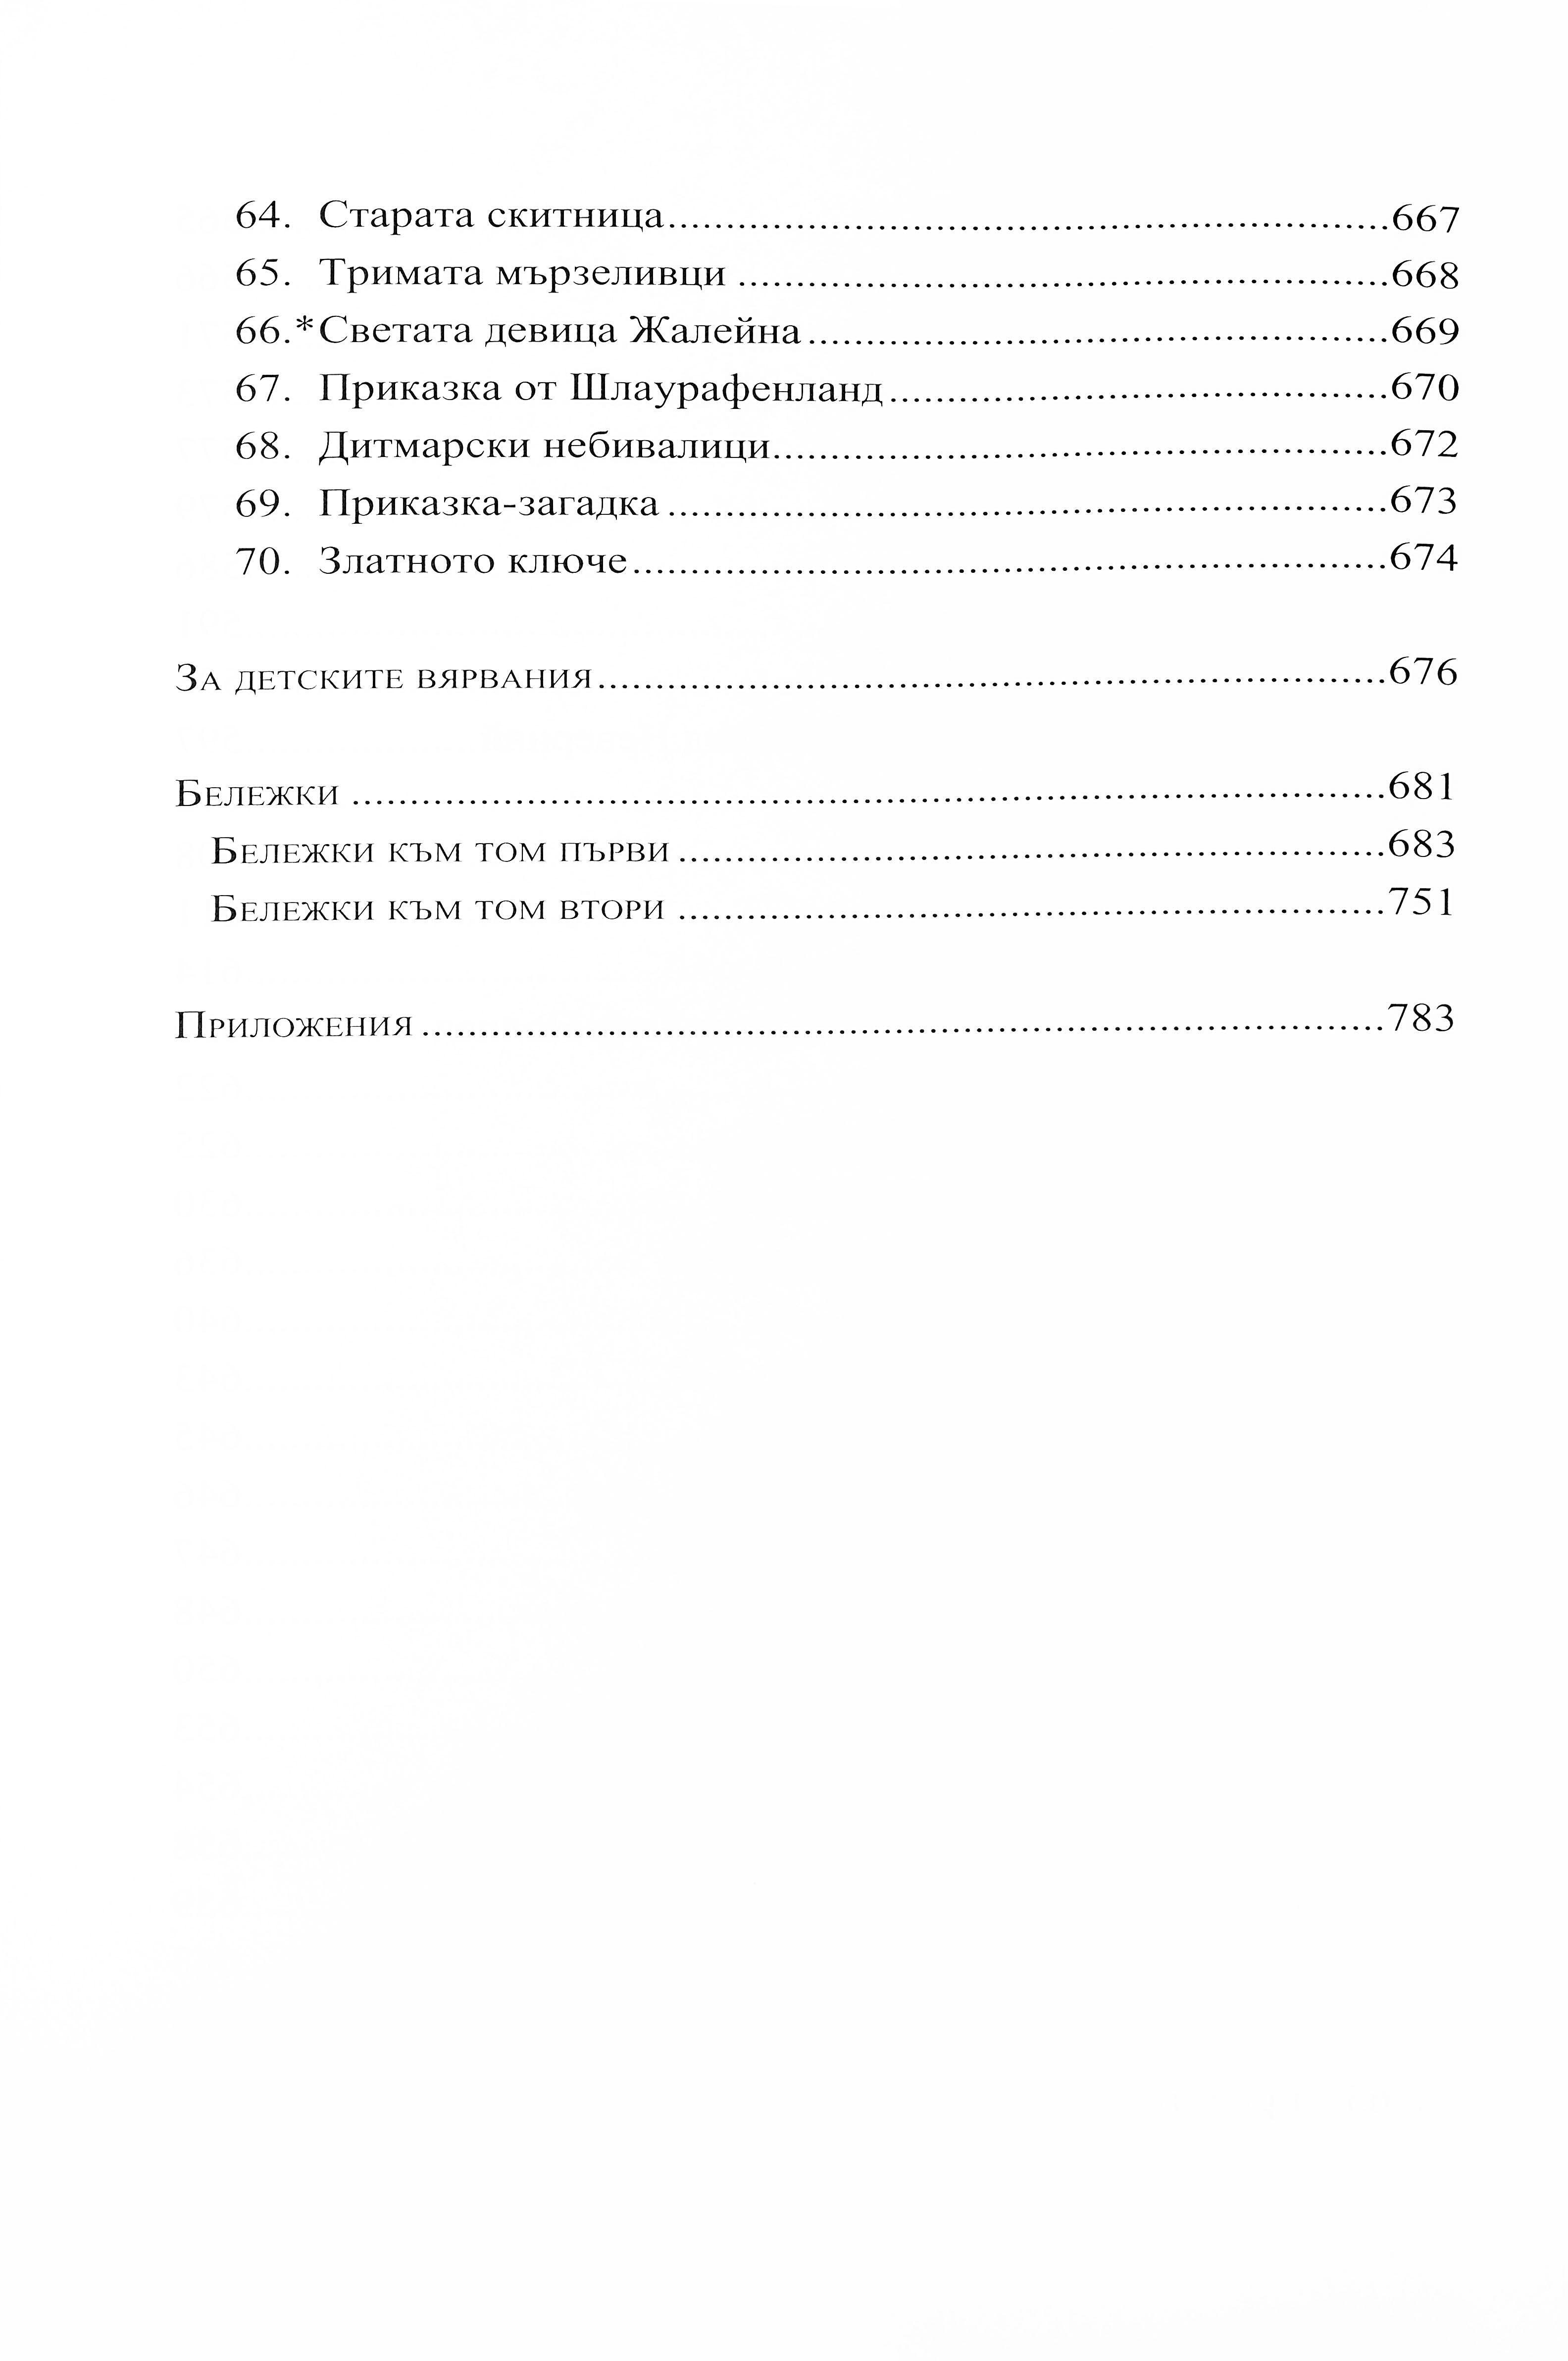 detski-i-domashni-prikazki-tvardi-koritsi-11 - 12